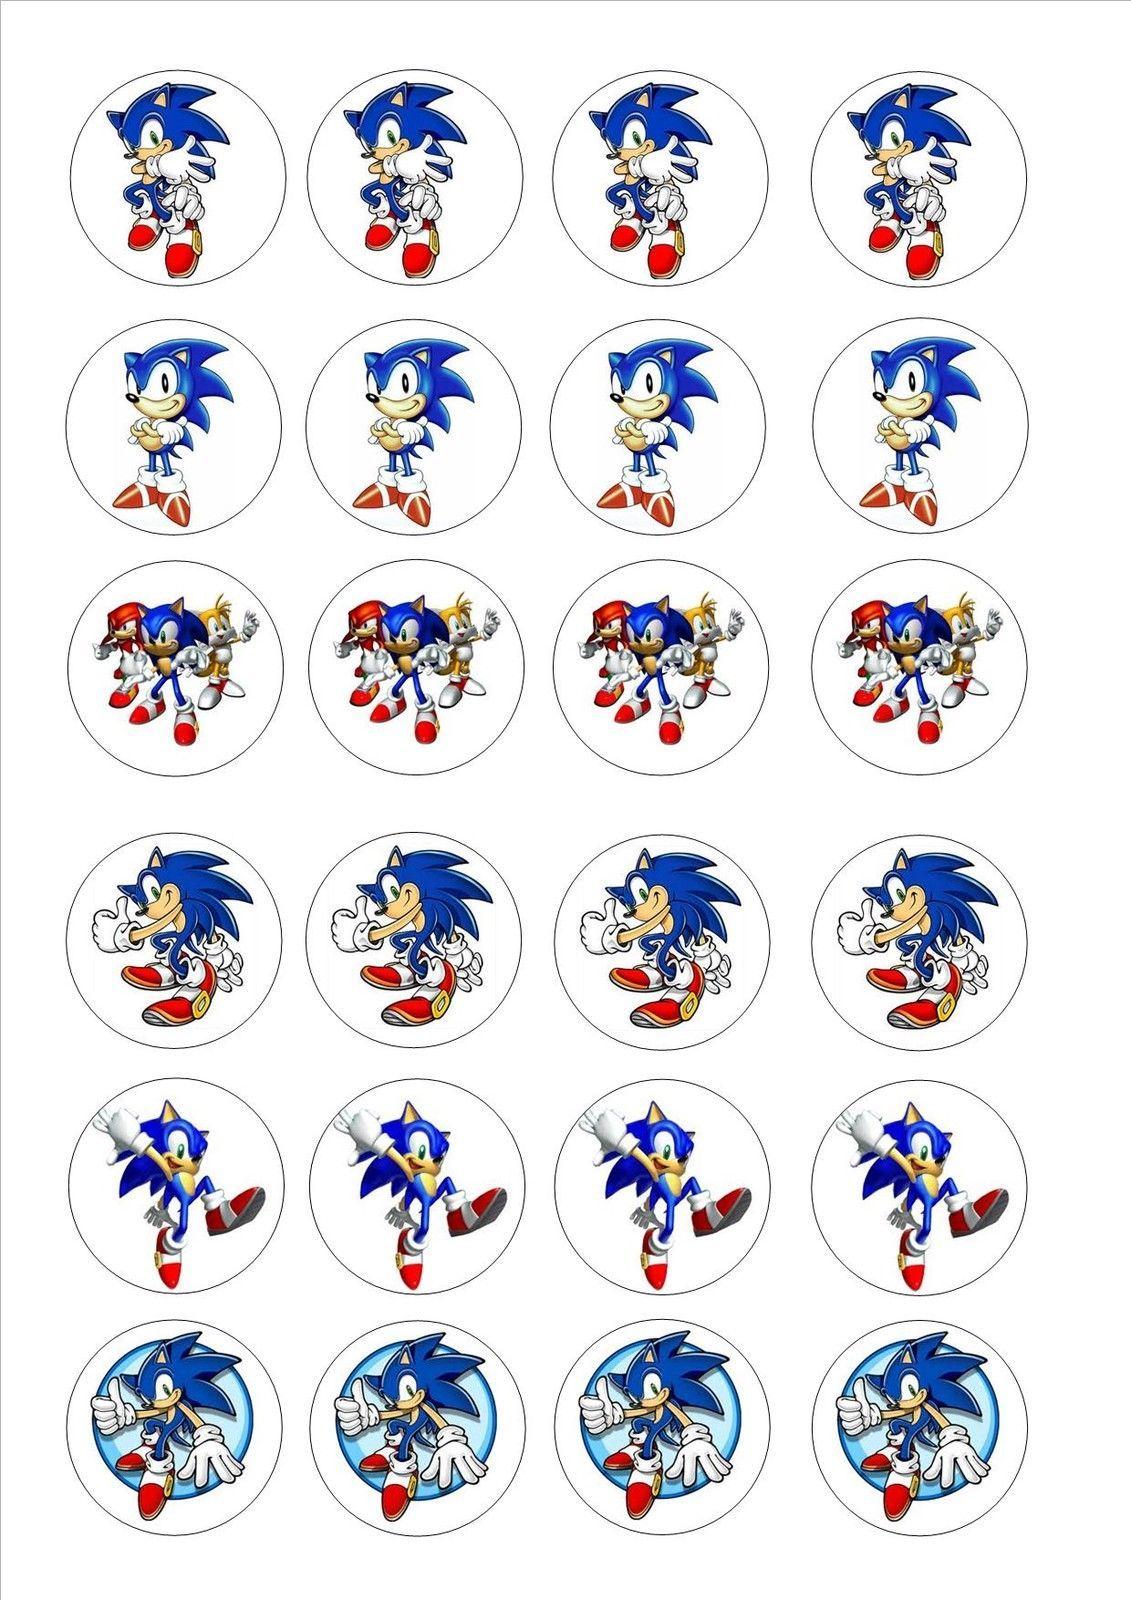 24 Icing Cake Toppers Decorations Birthday Sonic The Hedgehog Festas De Aniversario Do Sonic Aniversario Do Sonic Aniversario Do Vasco